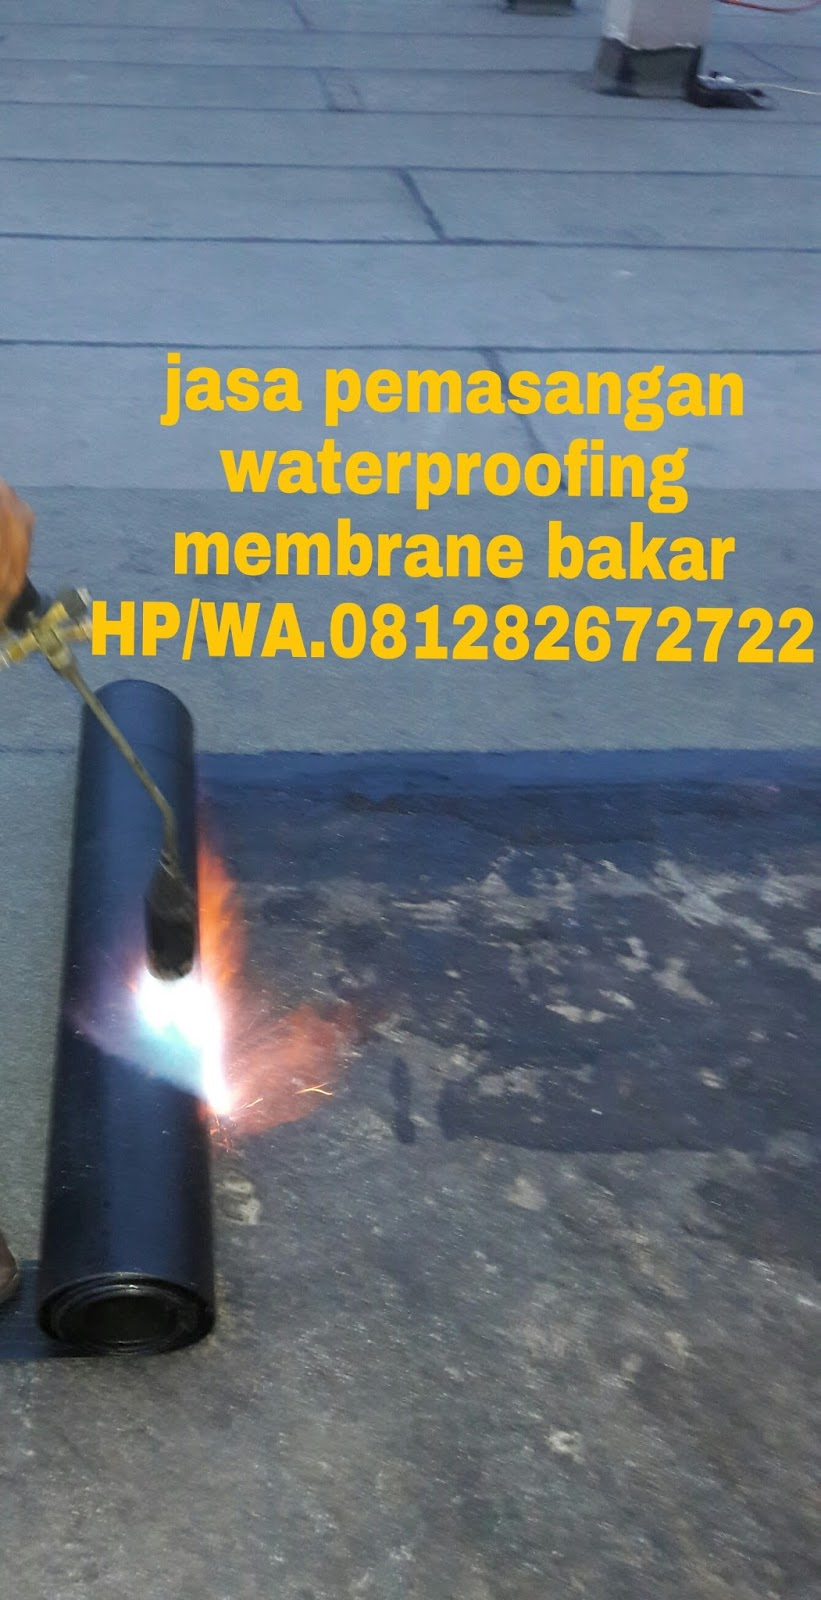 Jasa Pemasangan Waterproofing Membran Bakar